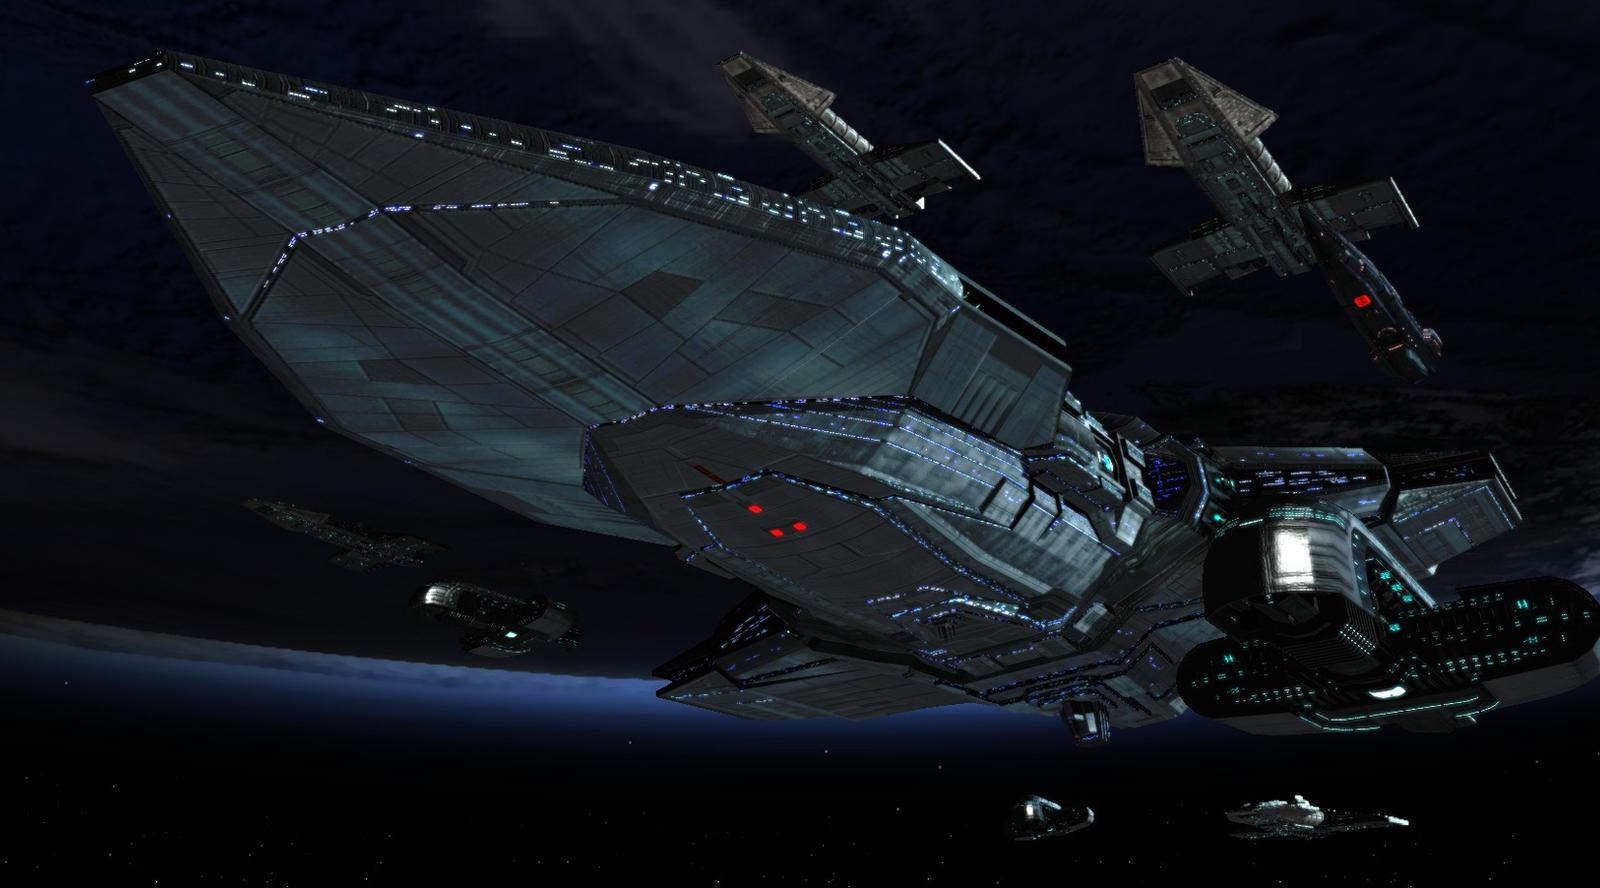 Traquia: Dark Side by Vince-T